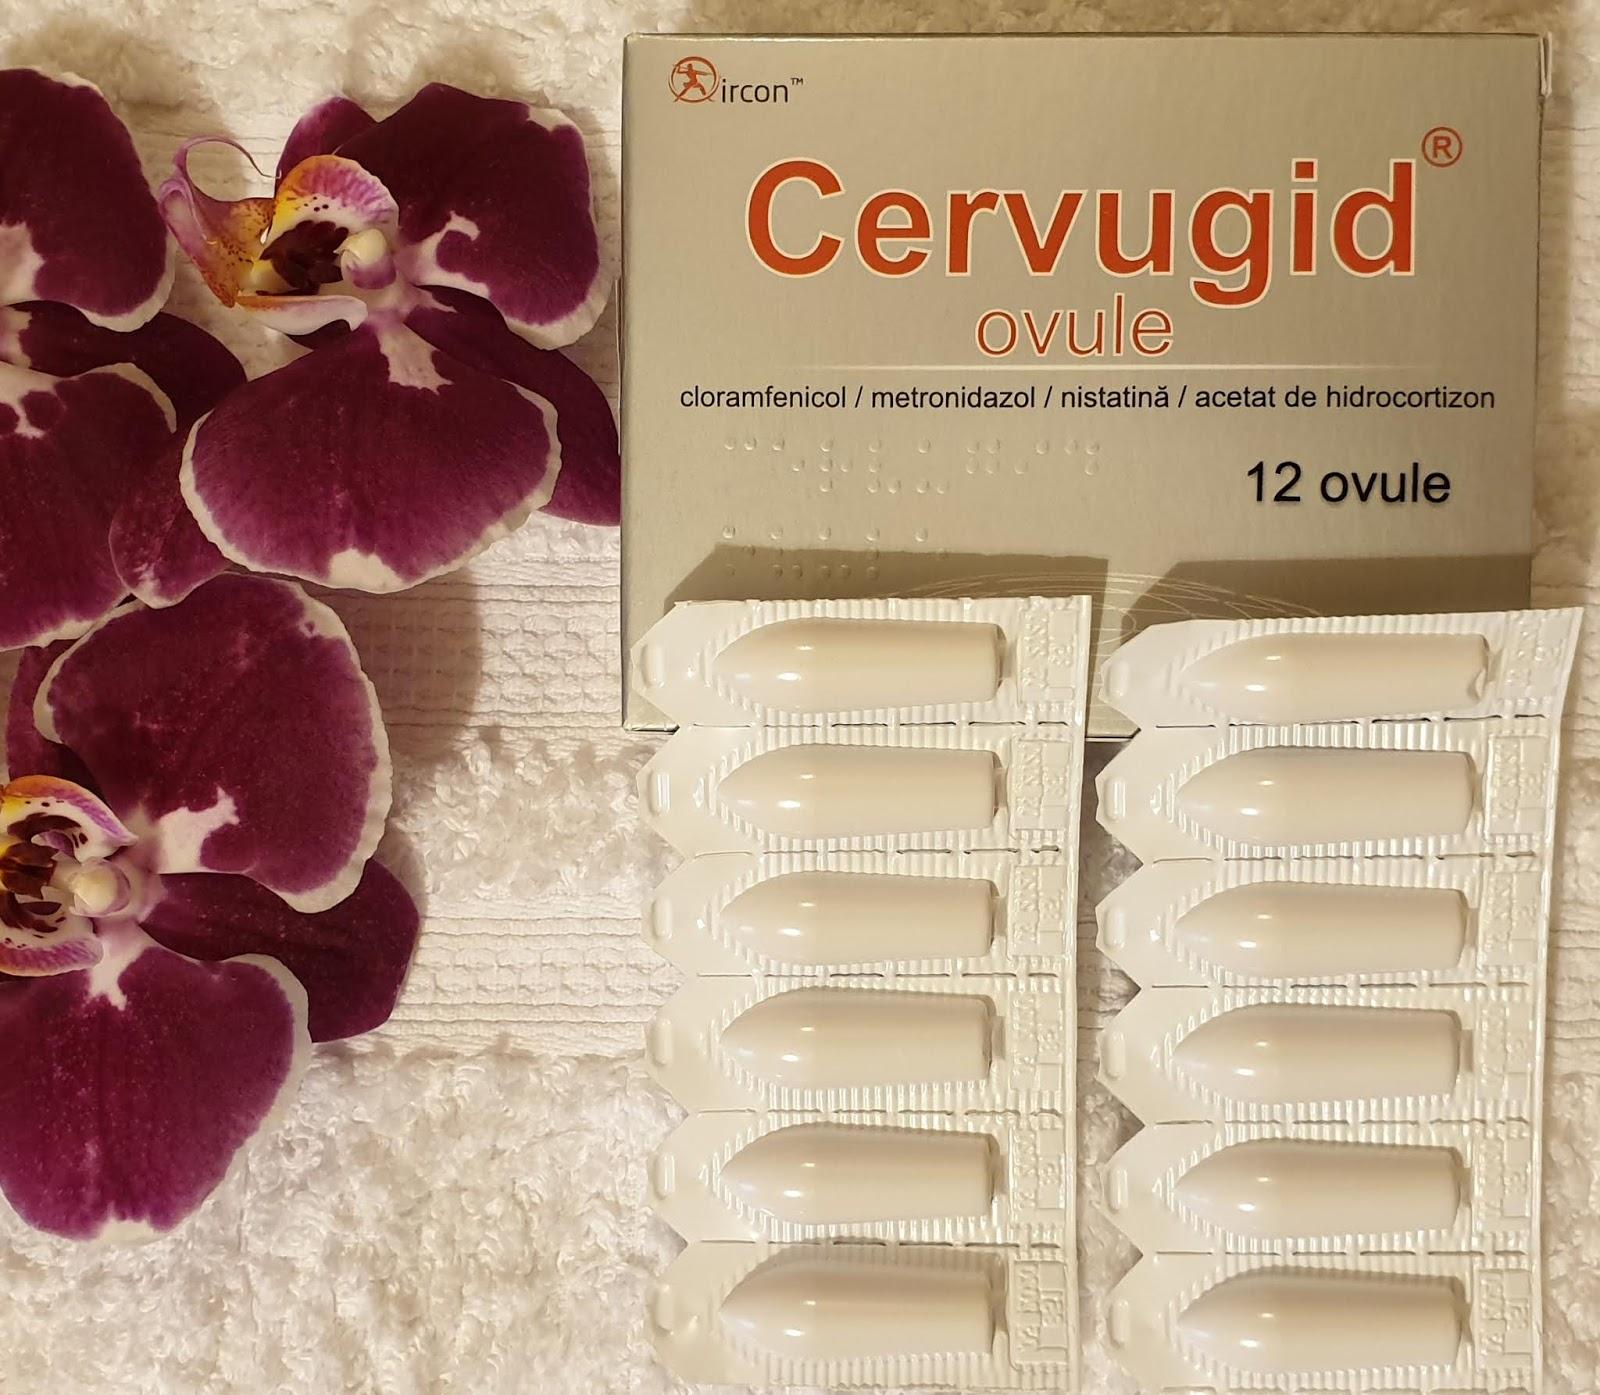 traitement papillomavirus ovule squamous papilloma and warts